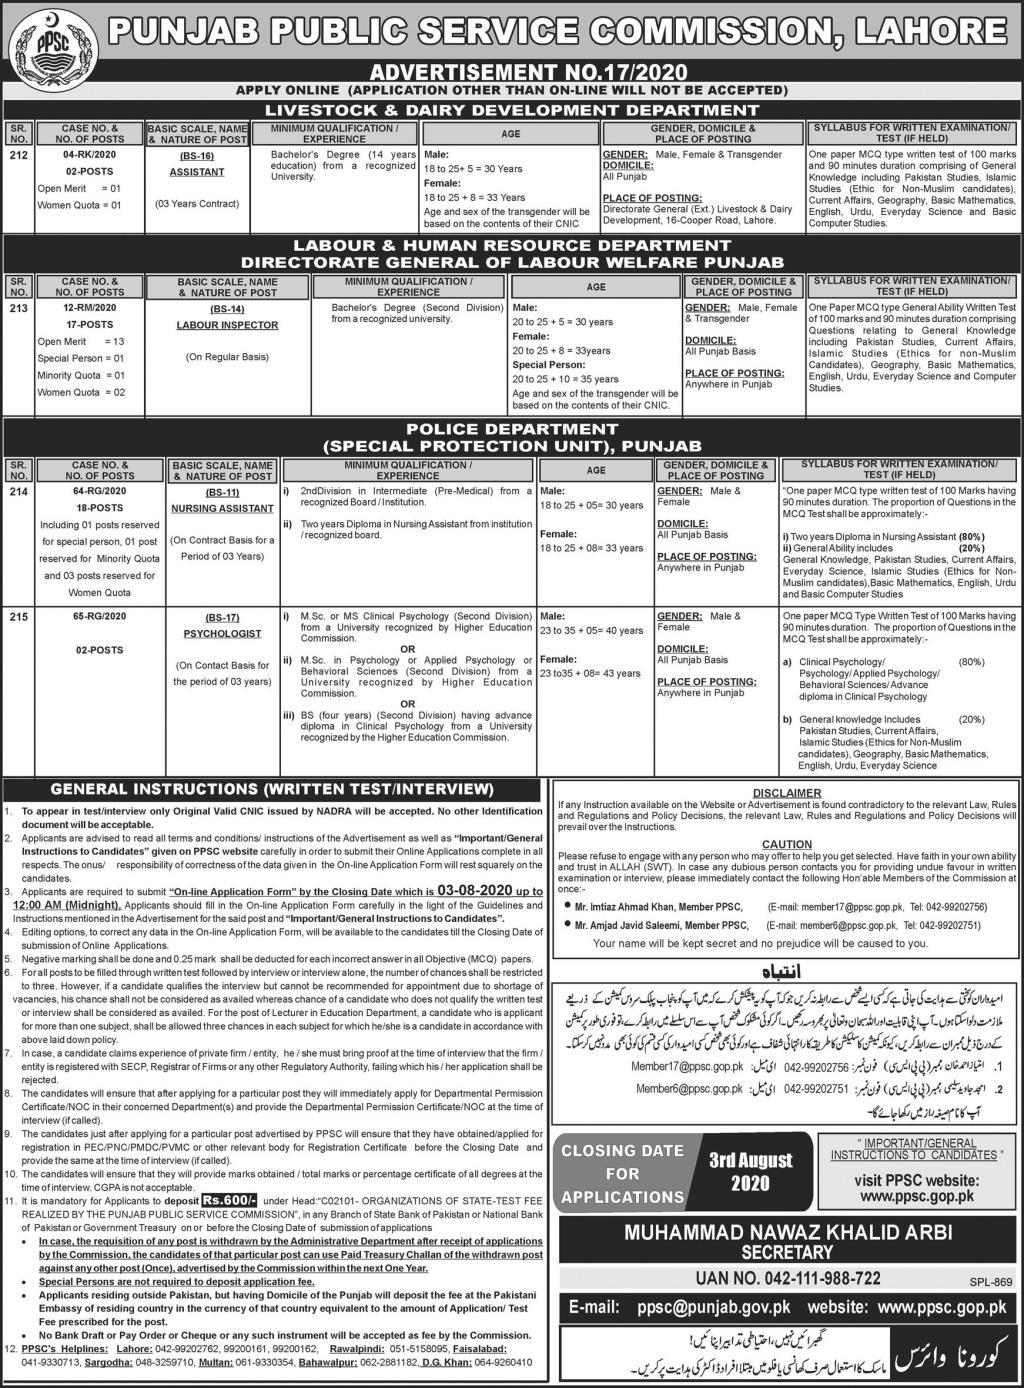 PPSC Jobs 2020 - Latest Jobs PPSC July 2020 Apply Online PPSC Jobs Advertisement No. 17/2020